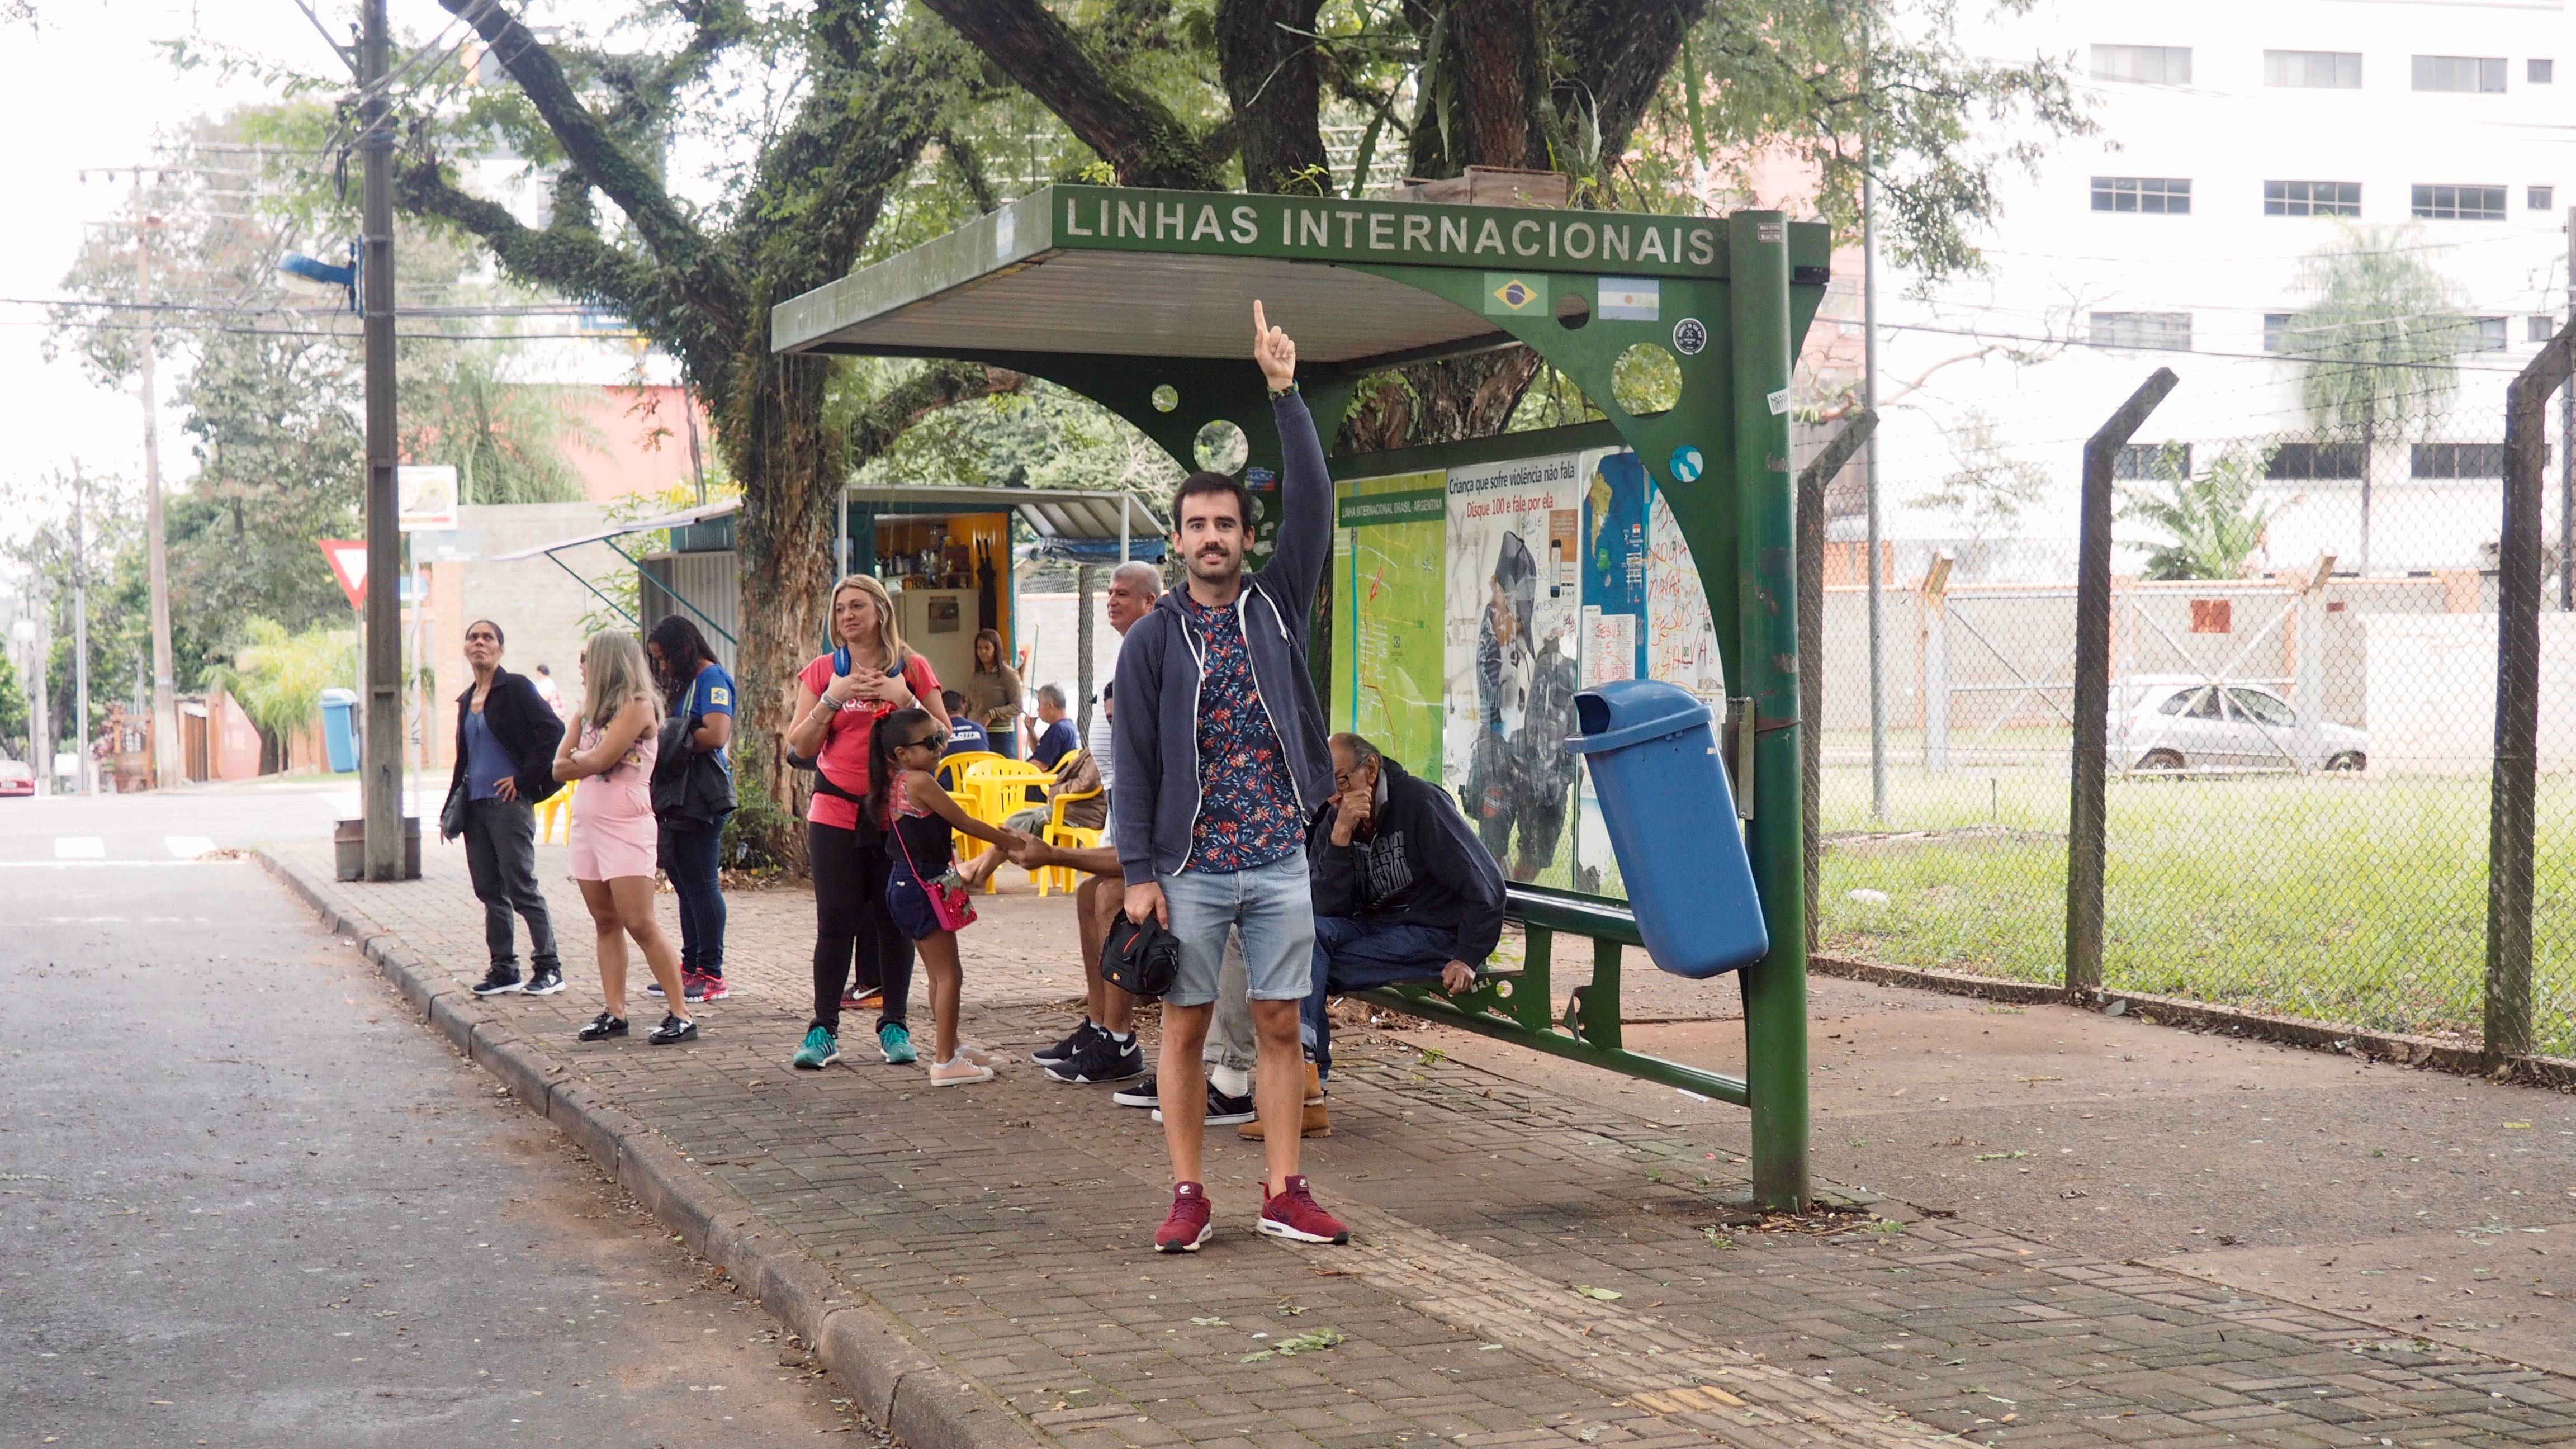 Parada del bus que cruza a Argentina. En Foz de Iguazú, Brasil.